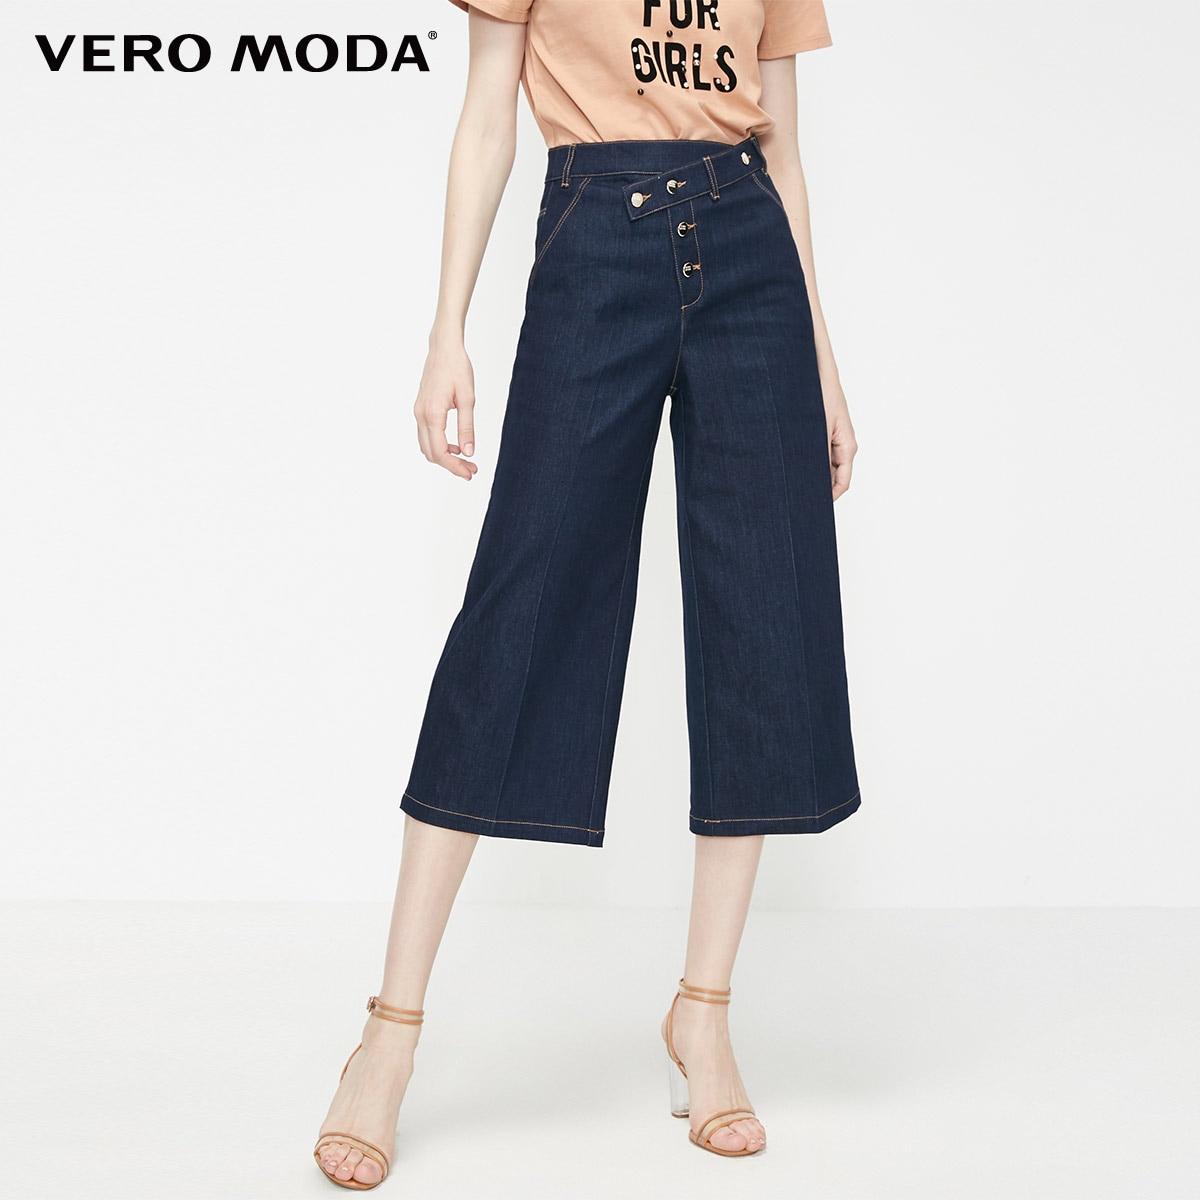 Vero Moda Women's Asymmetrical Waist Wide-leg Capri Pants | 31926I542